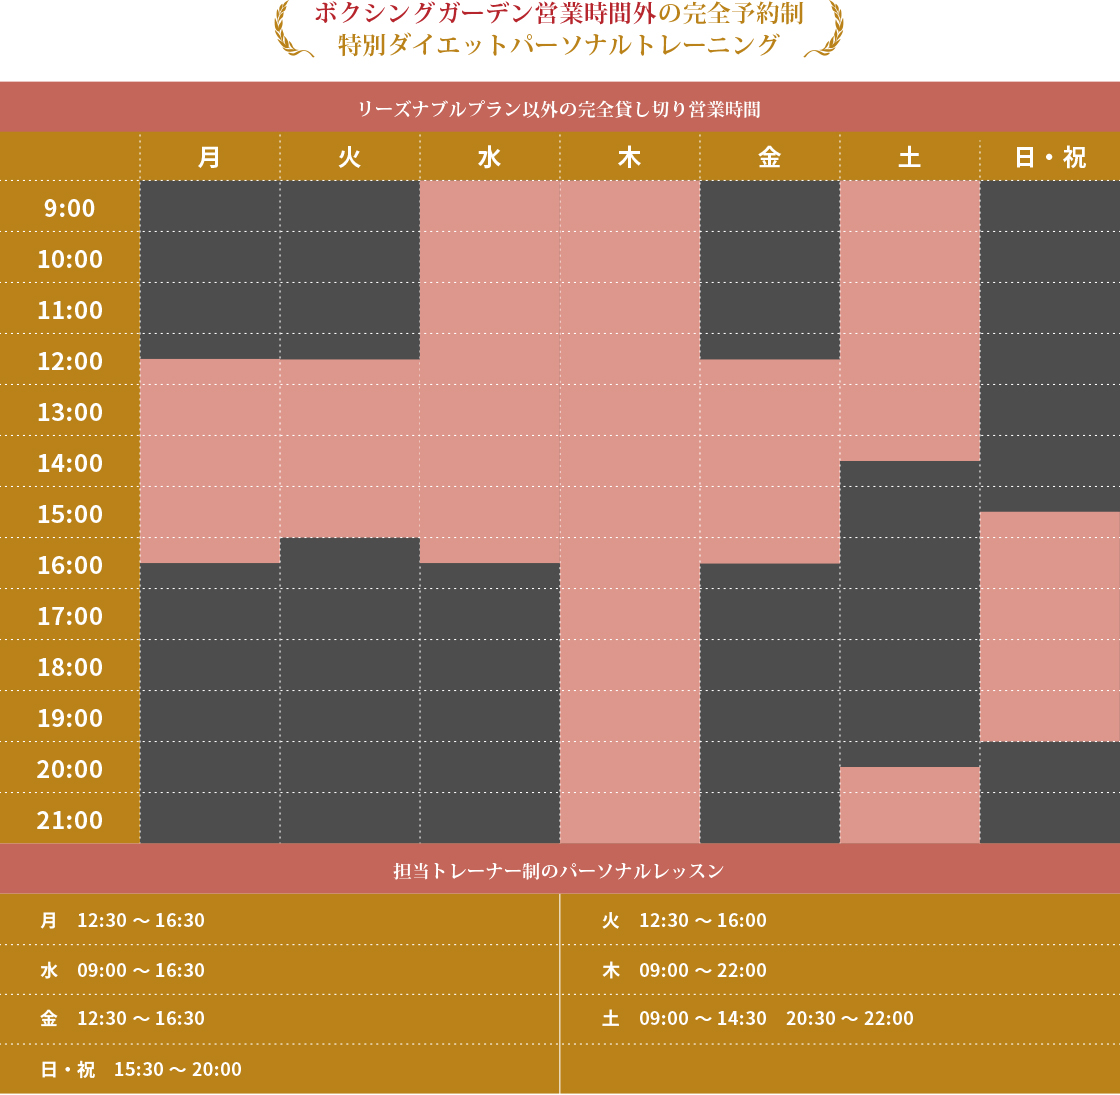 BOXPRIME二俣川店:営業時間